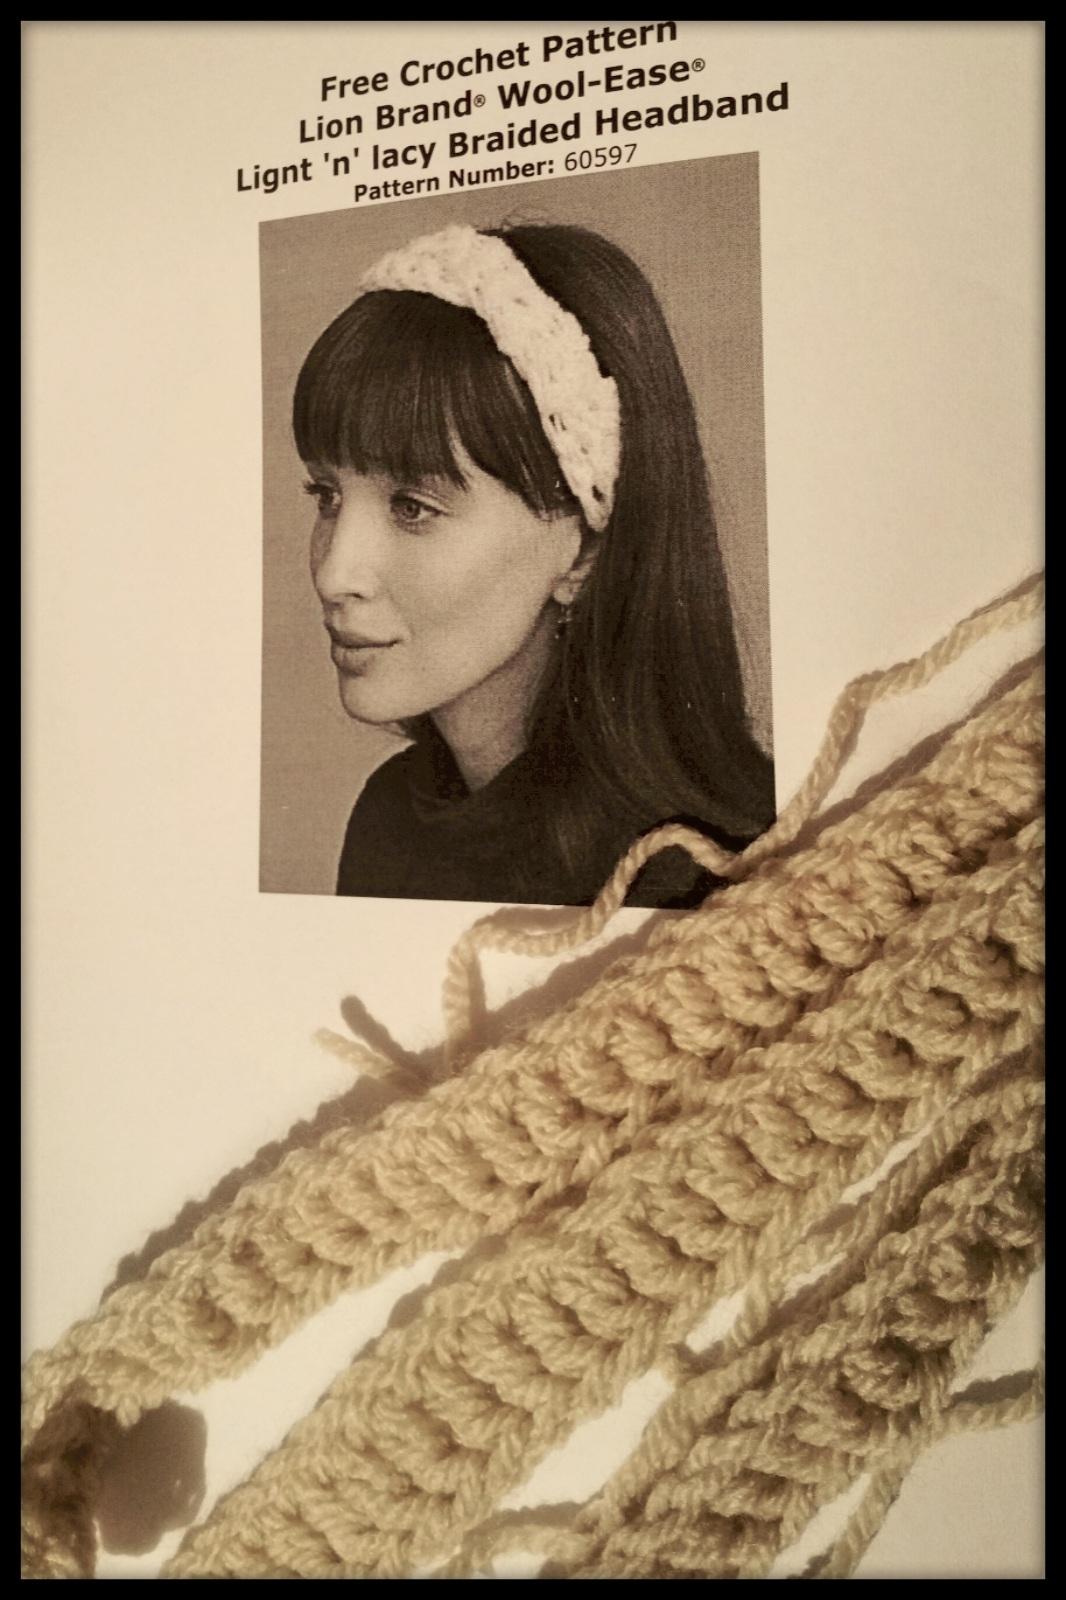 Light 'n' Lacy Braided Headband